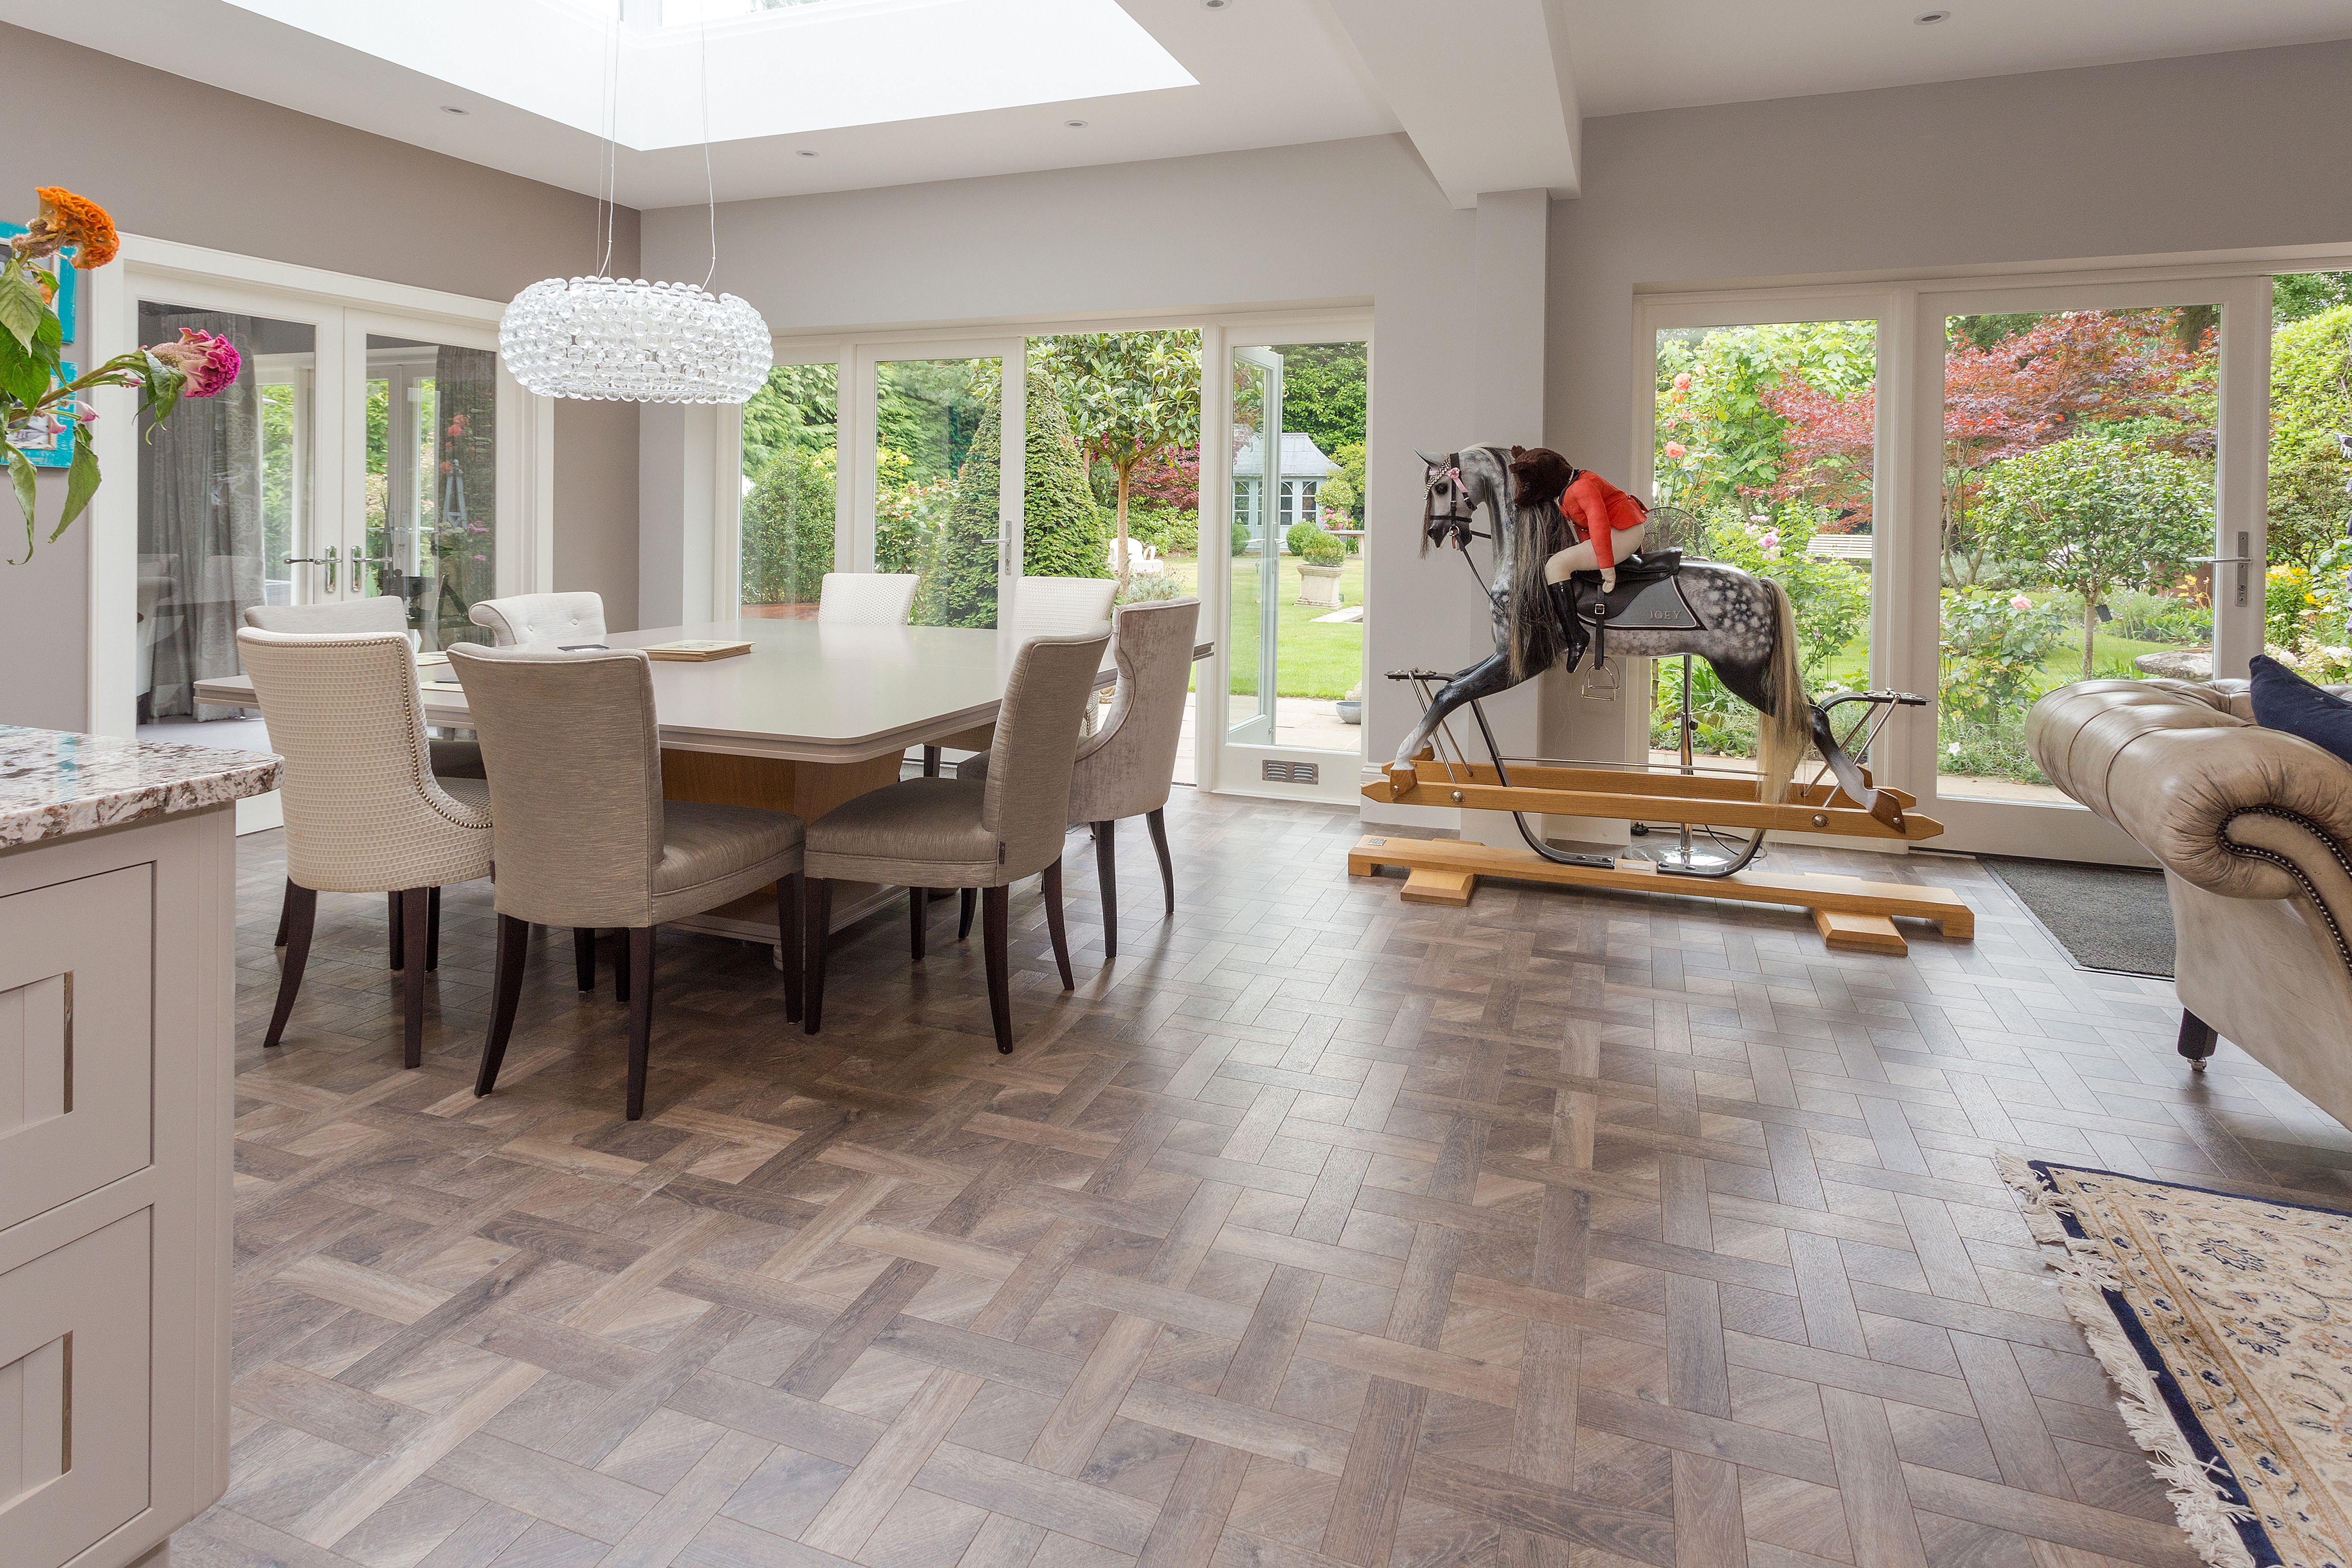 Amtico Signature Basketweave Luxury Vinyl Tile Flooring To Kitchen With Large Island Luxury Vinyl Tile Luxury Vinyl Tile Flooring Carpet Fitting